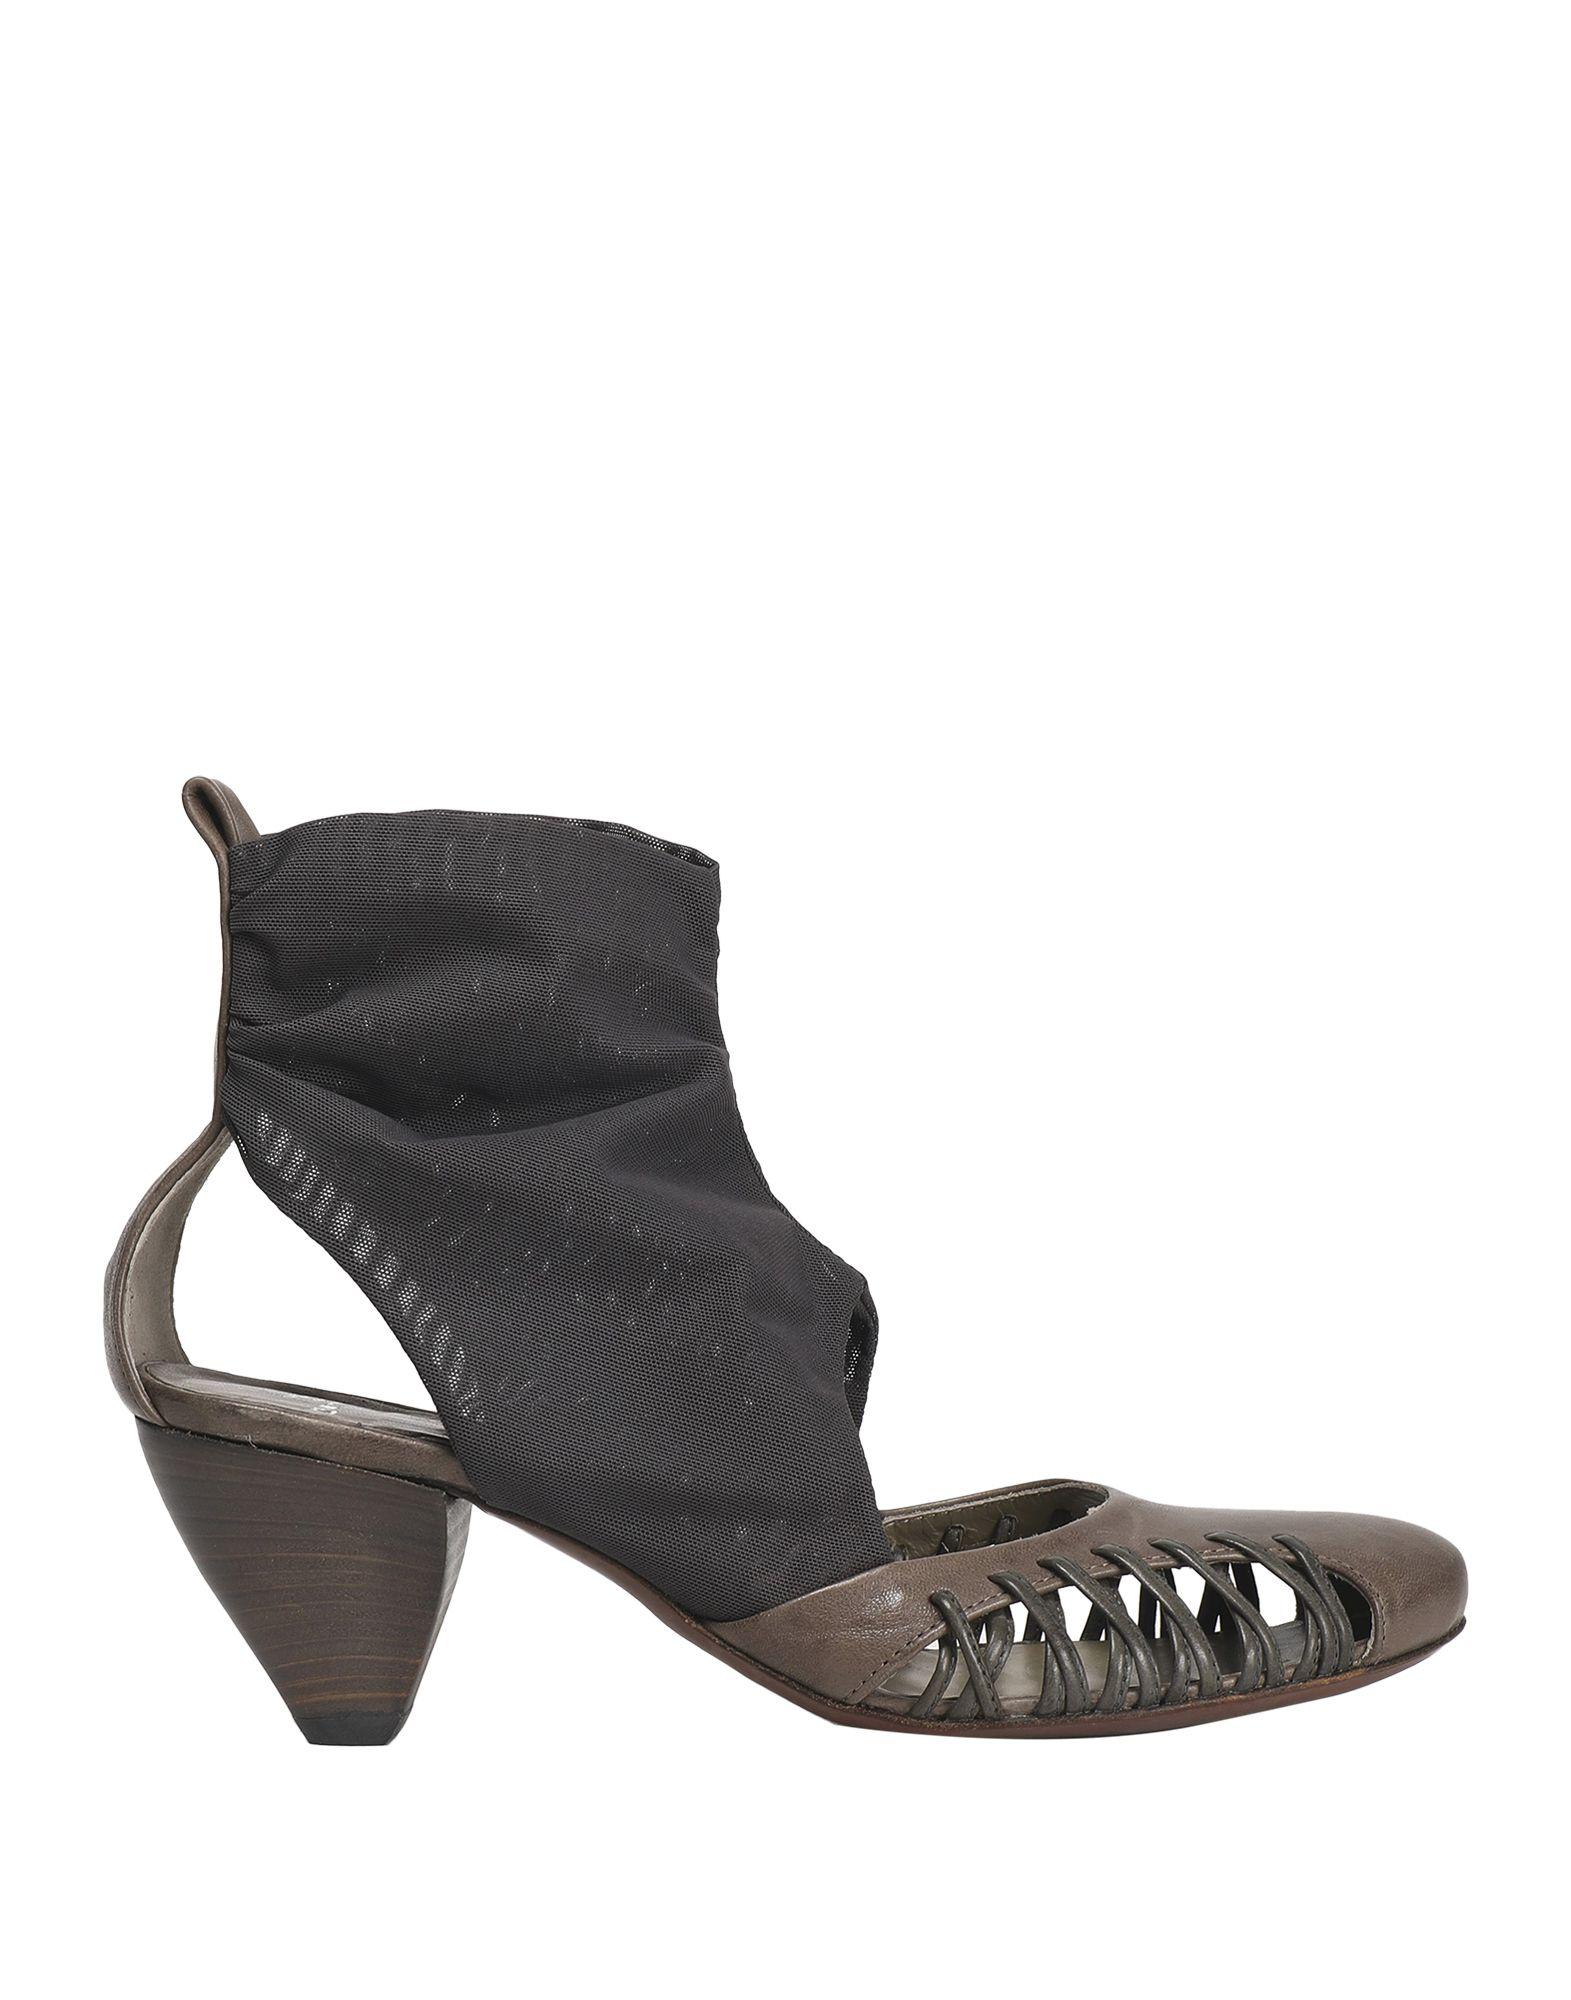 Ixos Ixos Ankle Boot - Women Ixos Ixos Ankle Boots online on  United Kingdom - 11567818LX 0a2628